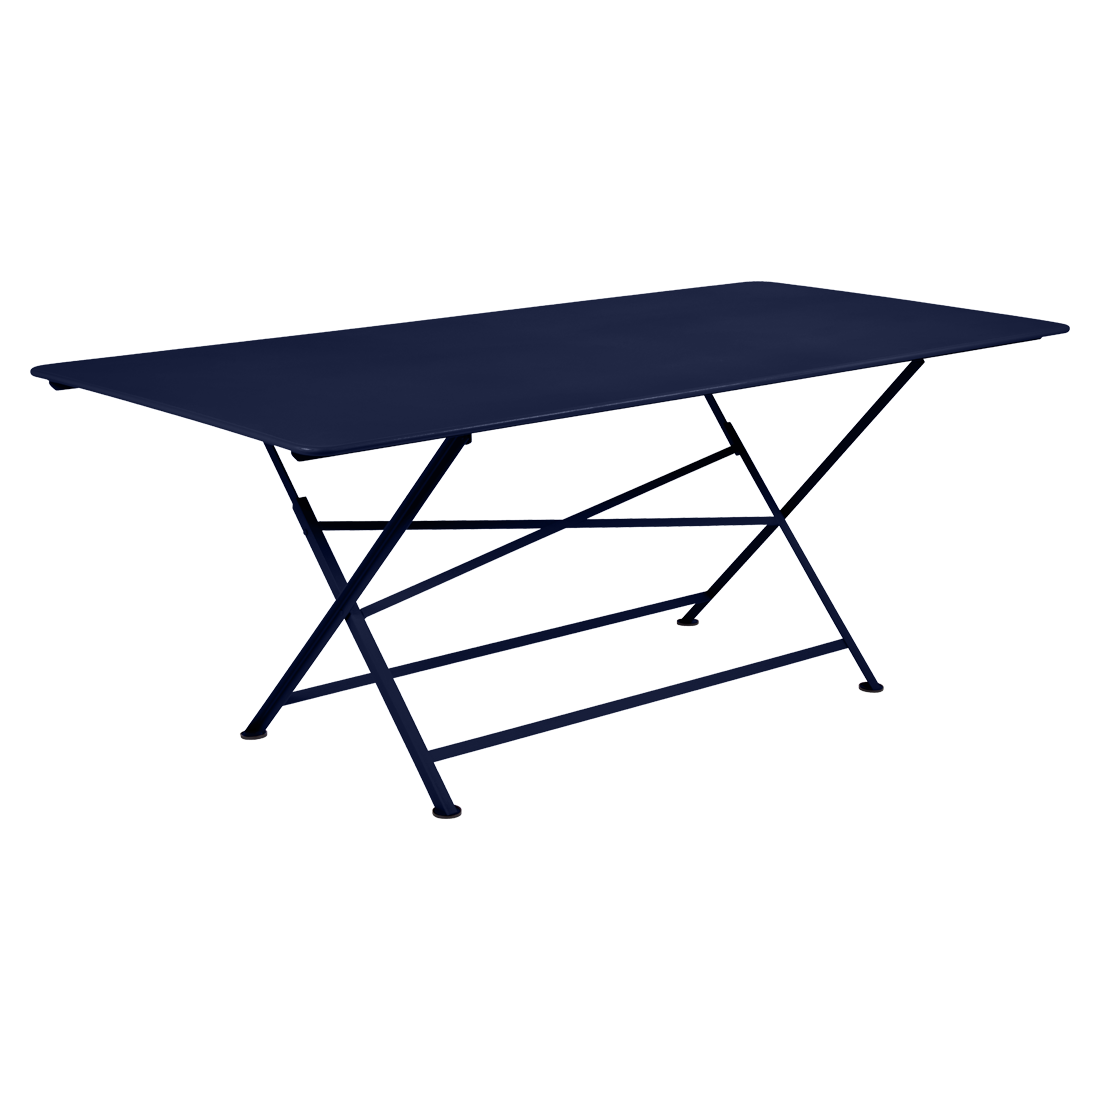 table de jardin, table metal, table de jardin pliante, table metal pliante, table fermob bleu